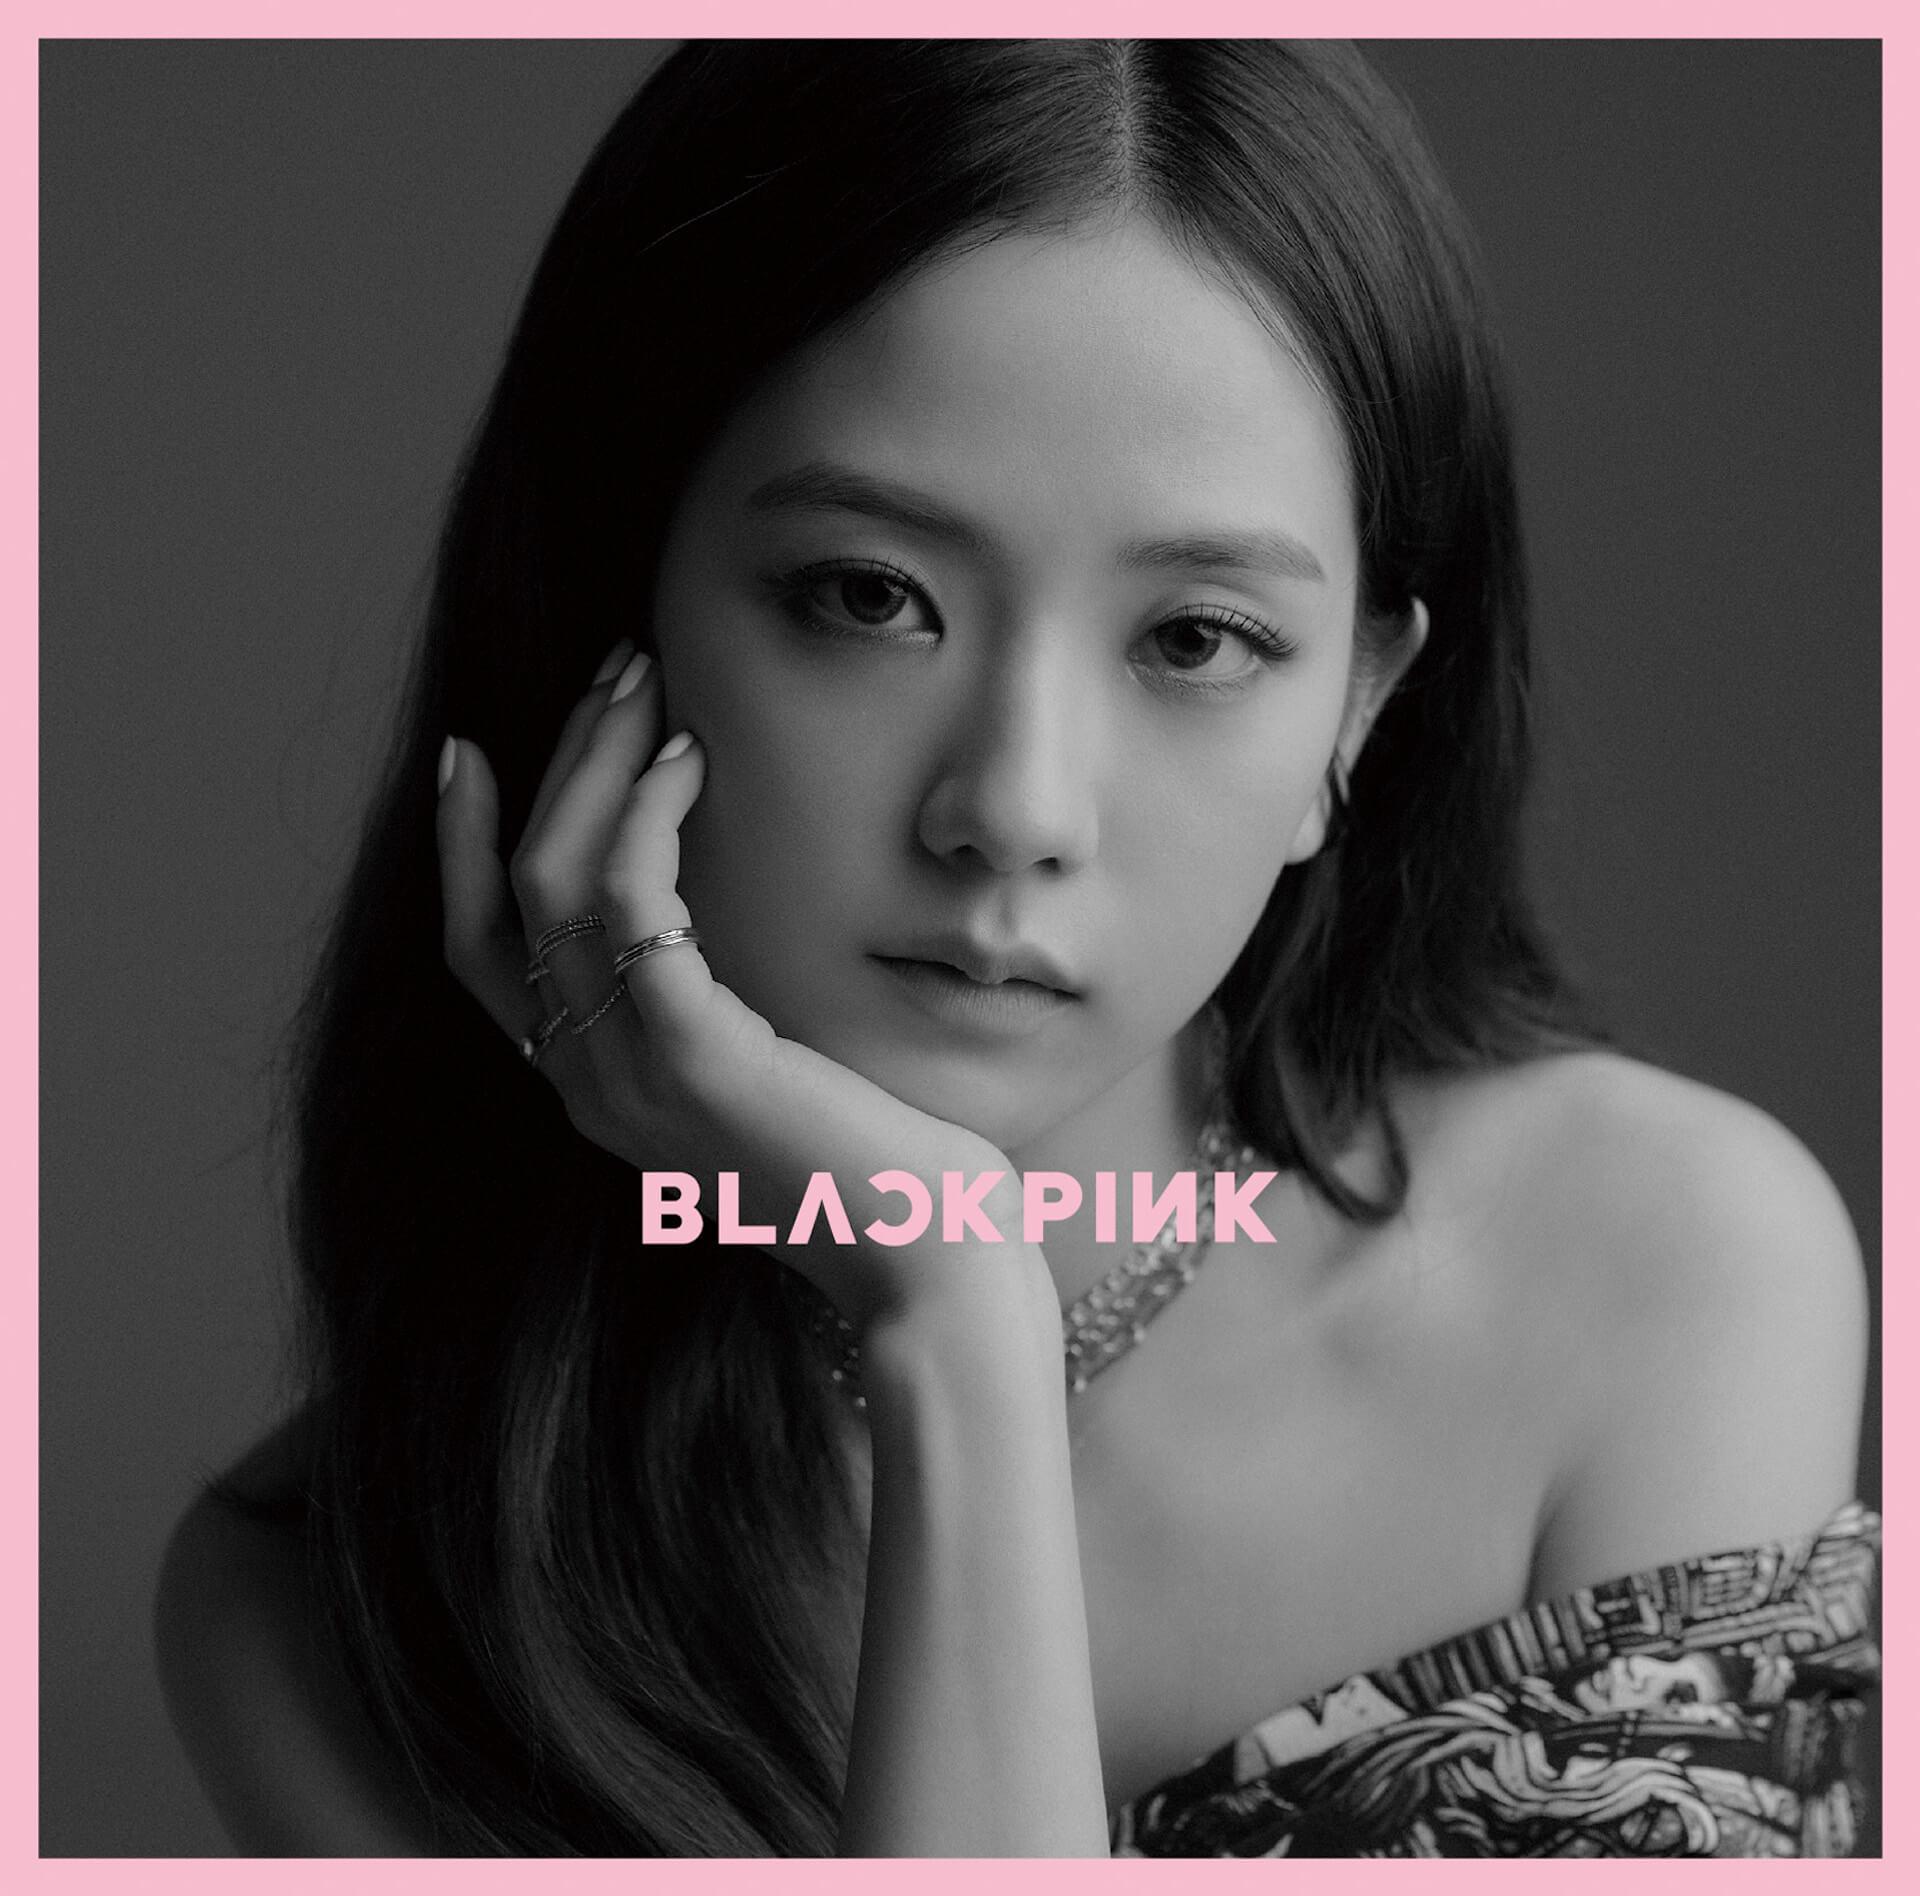 BLACKPINK「Kill This Love」MV6億再生を記録!公開から177日、グループ史上最速 music190930_blackpink_2